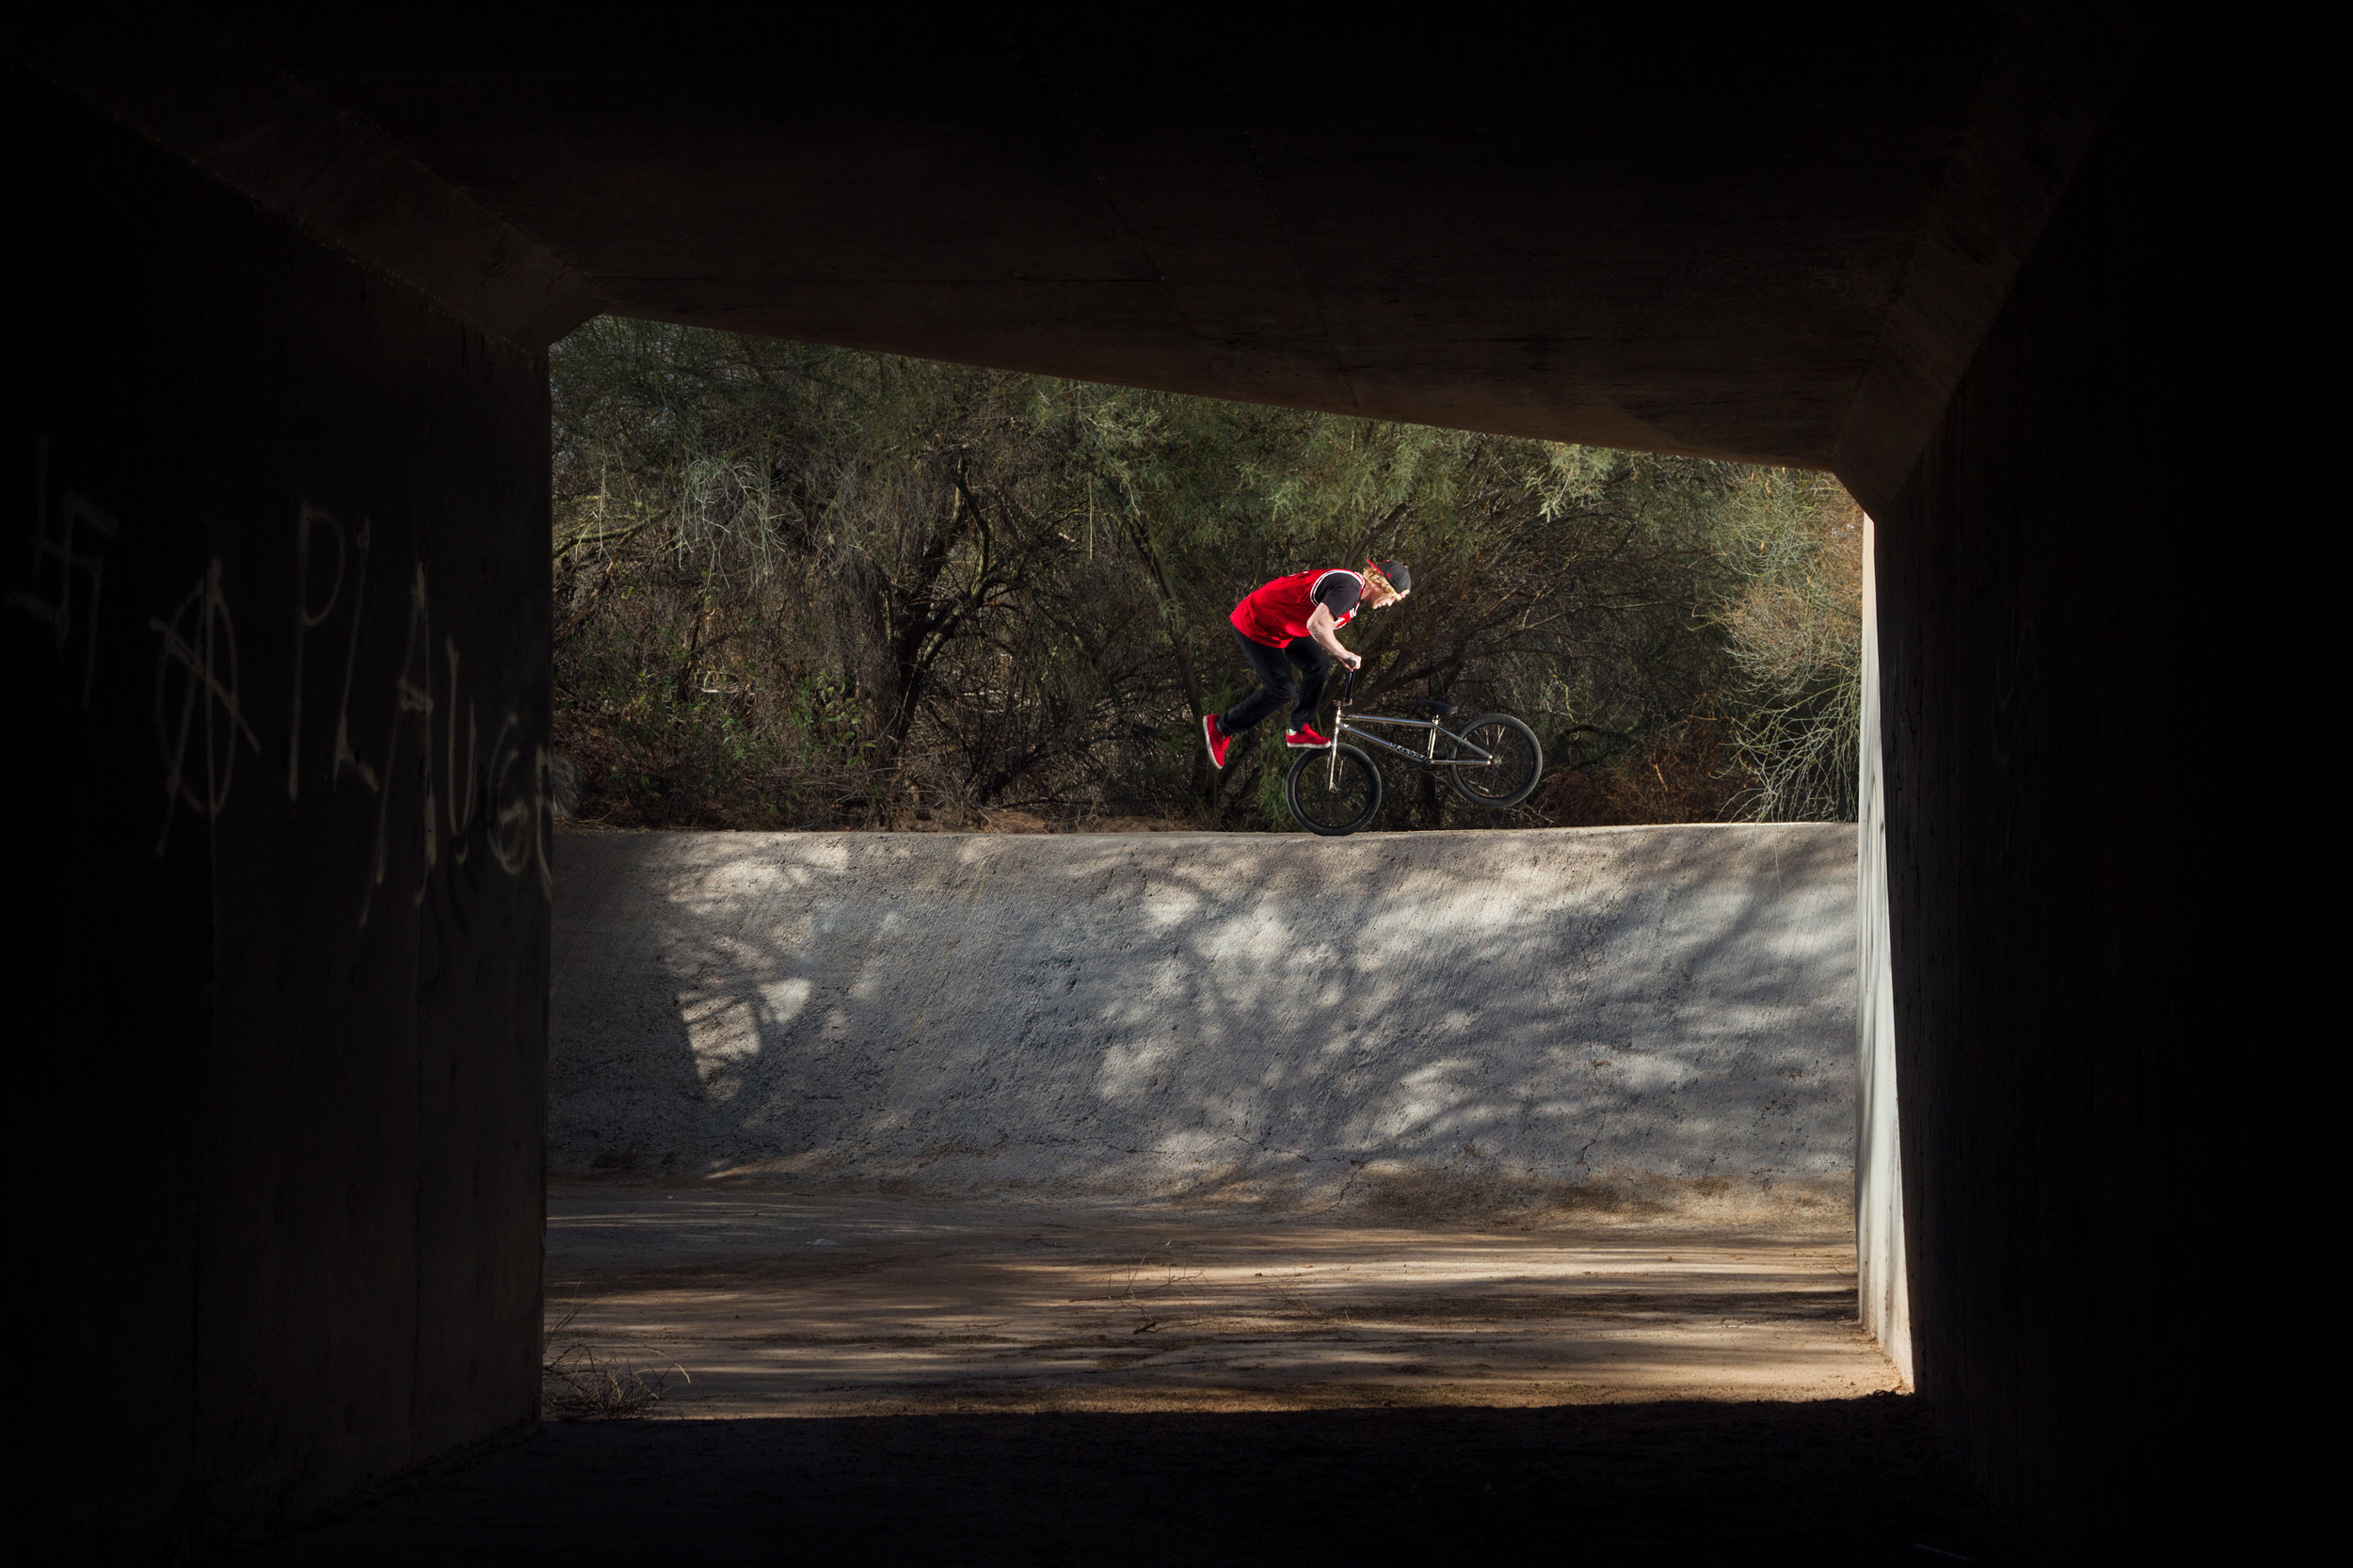 Josh-Eilken-BMX-Footjam-Whip-Devin-Feil.jpg